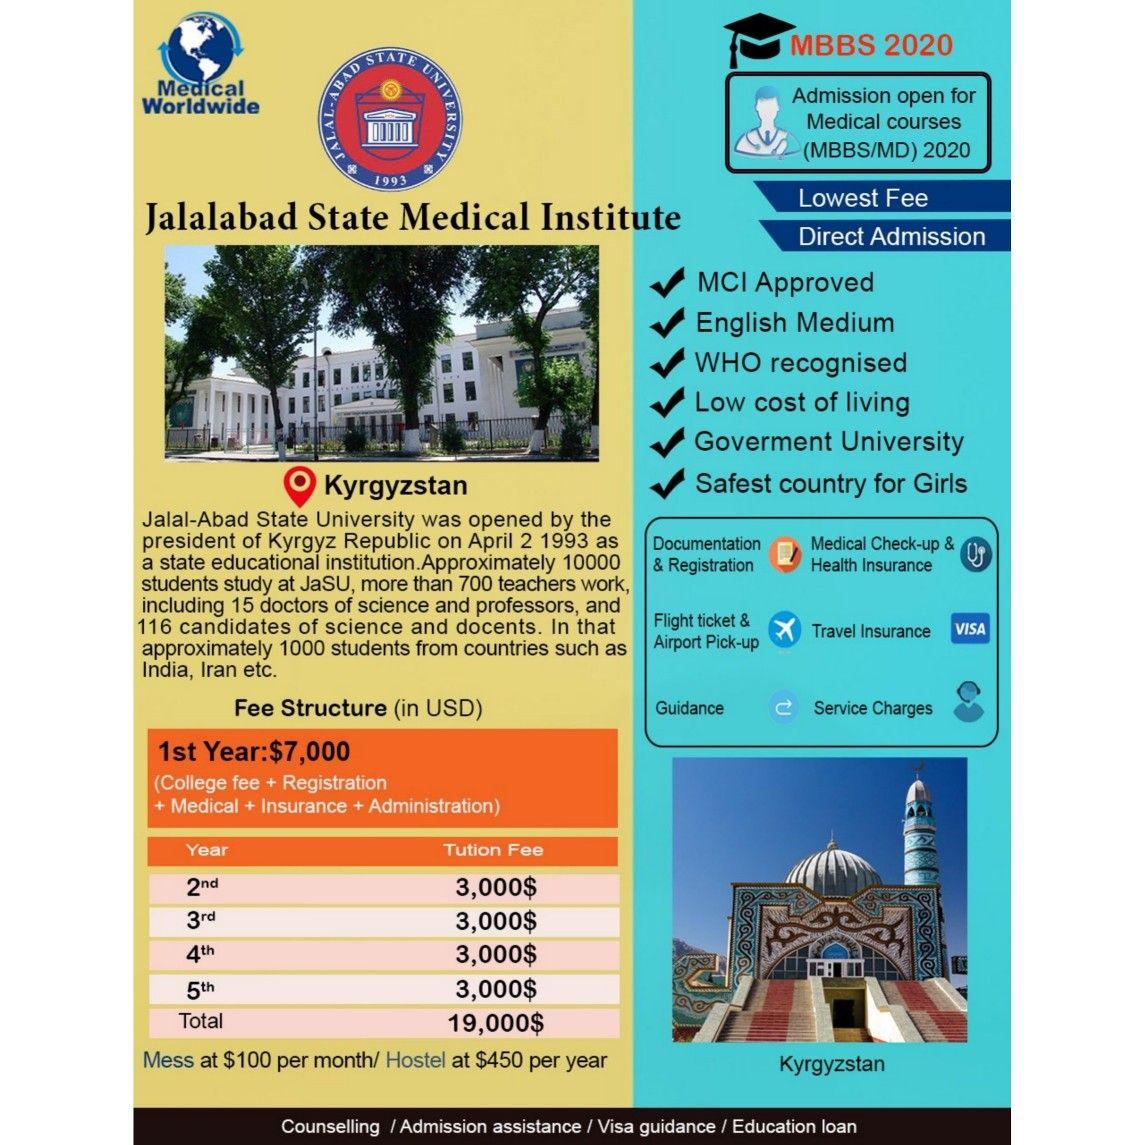 Jalalabad State Medical Institute Medical State University States